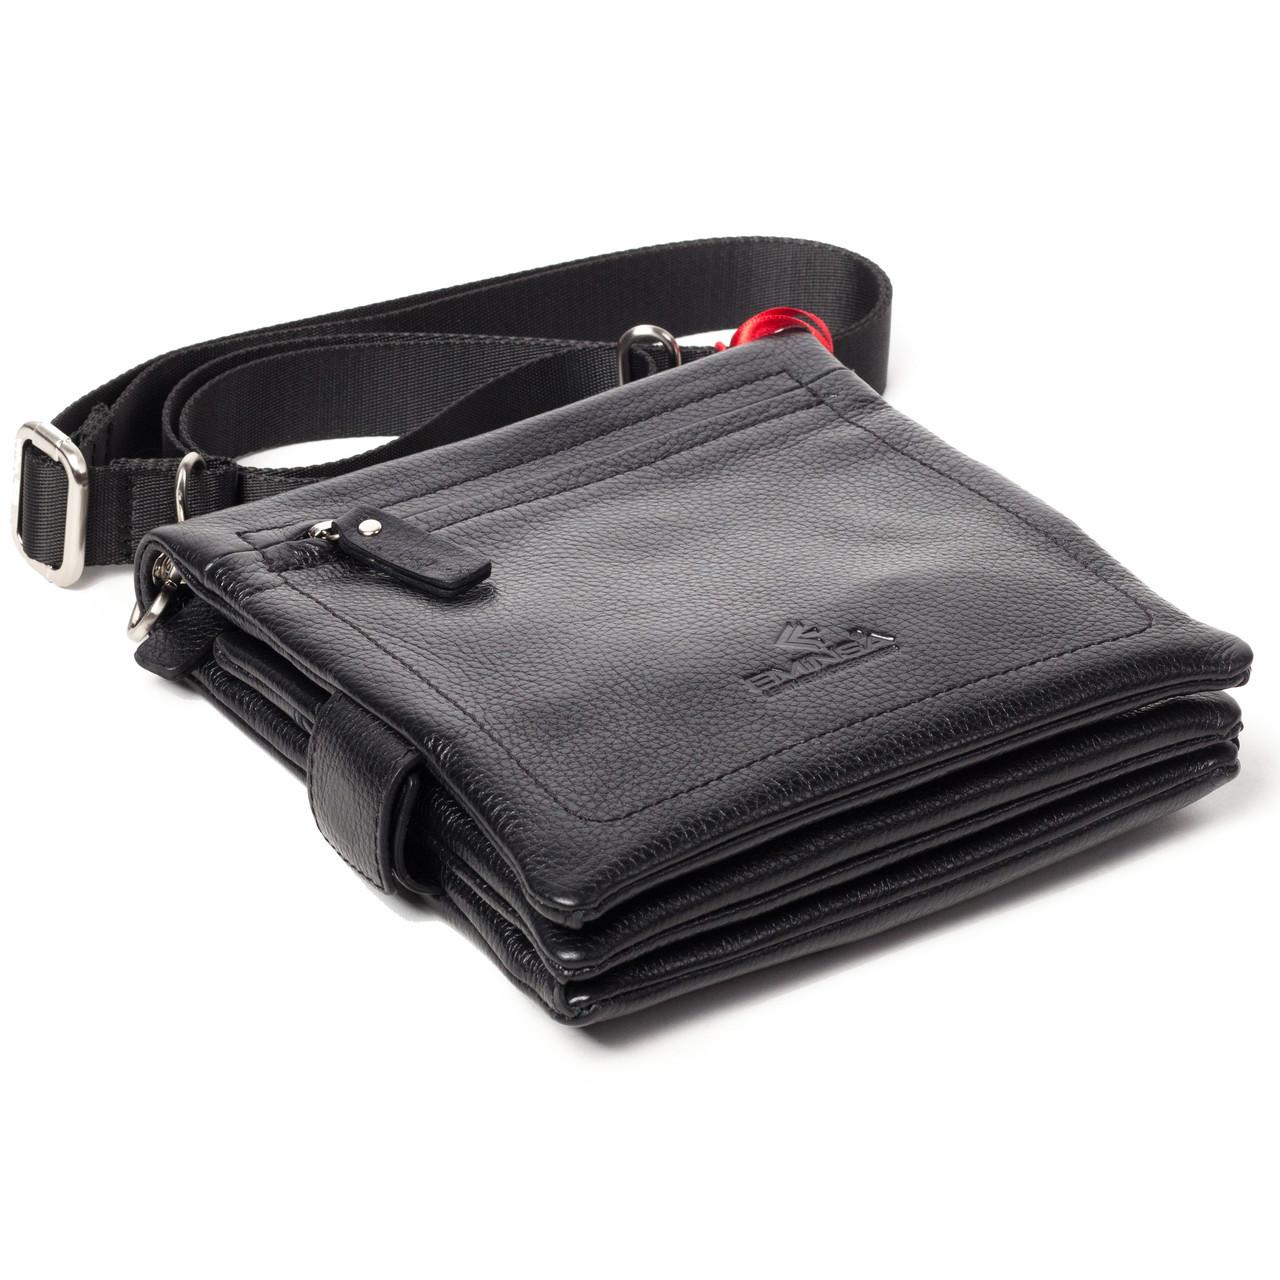 Мужская сумка кожаная черная Eminsa 6096-37-1